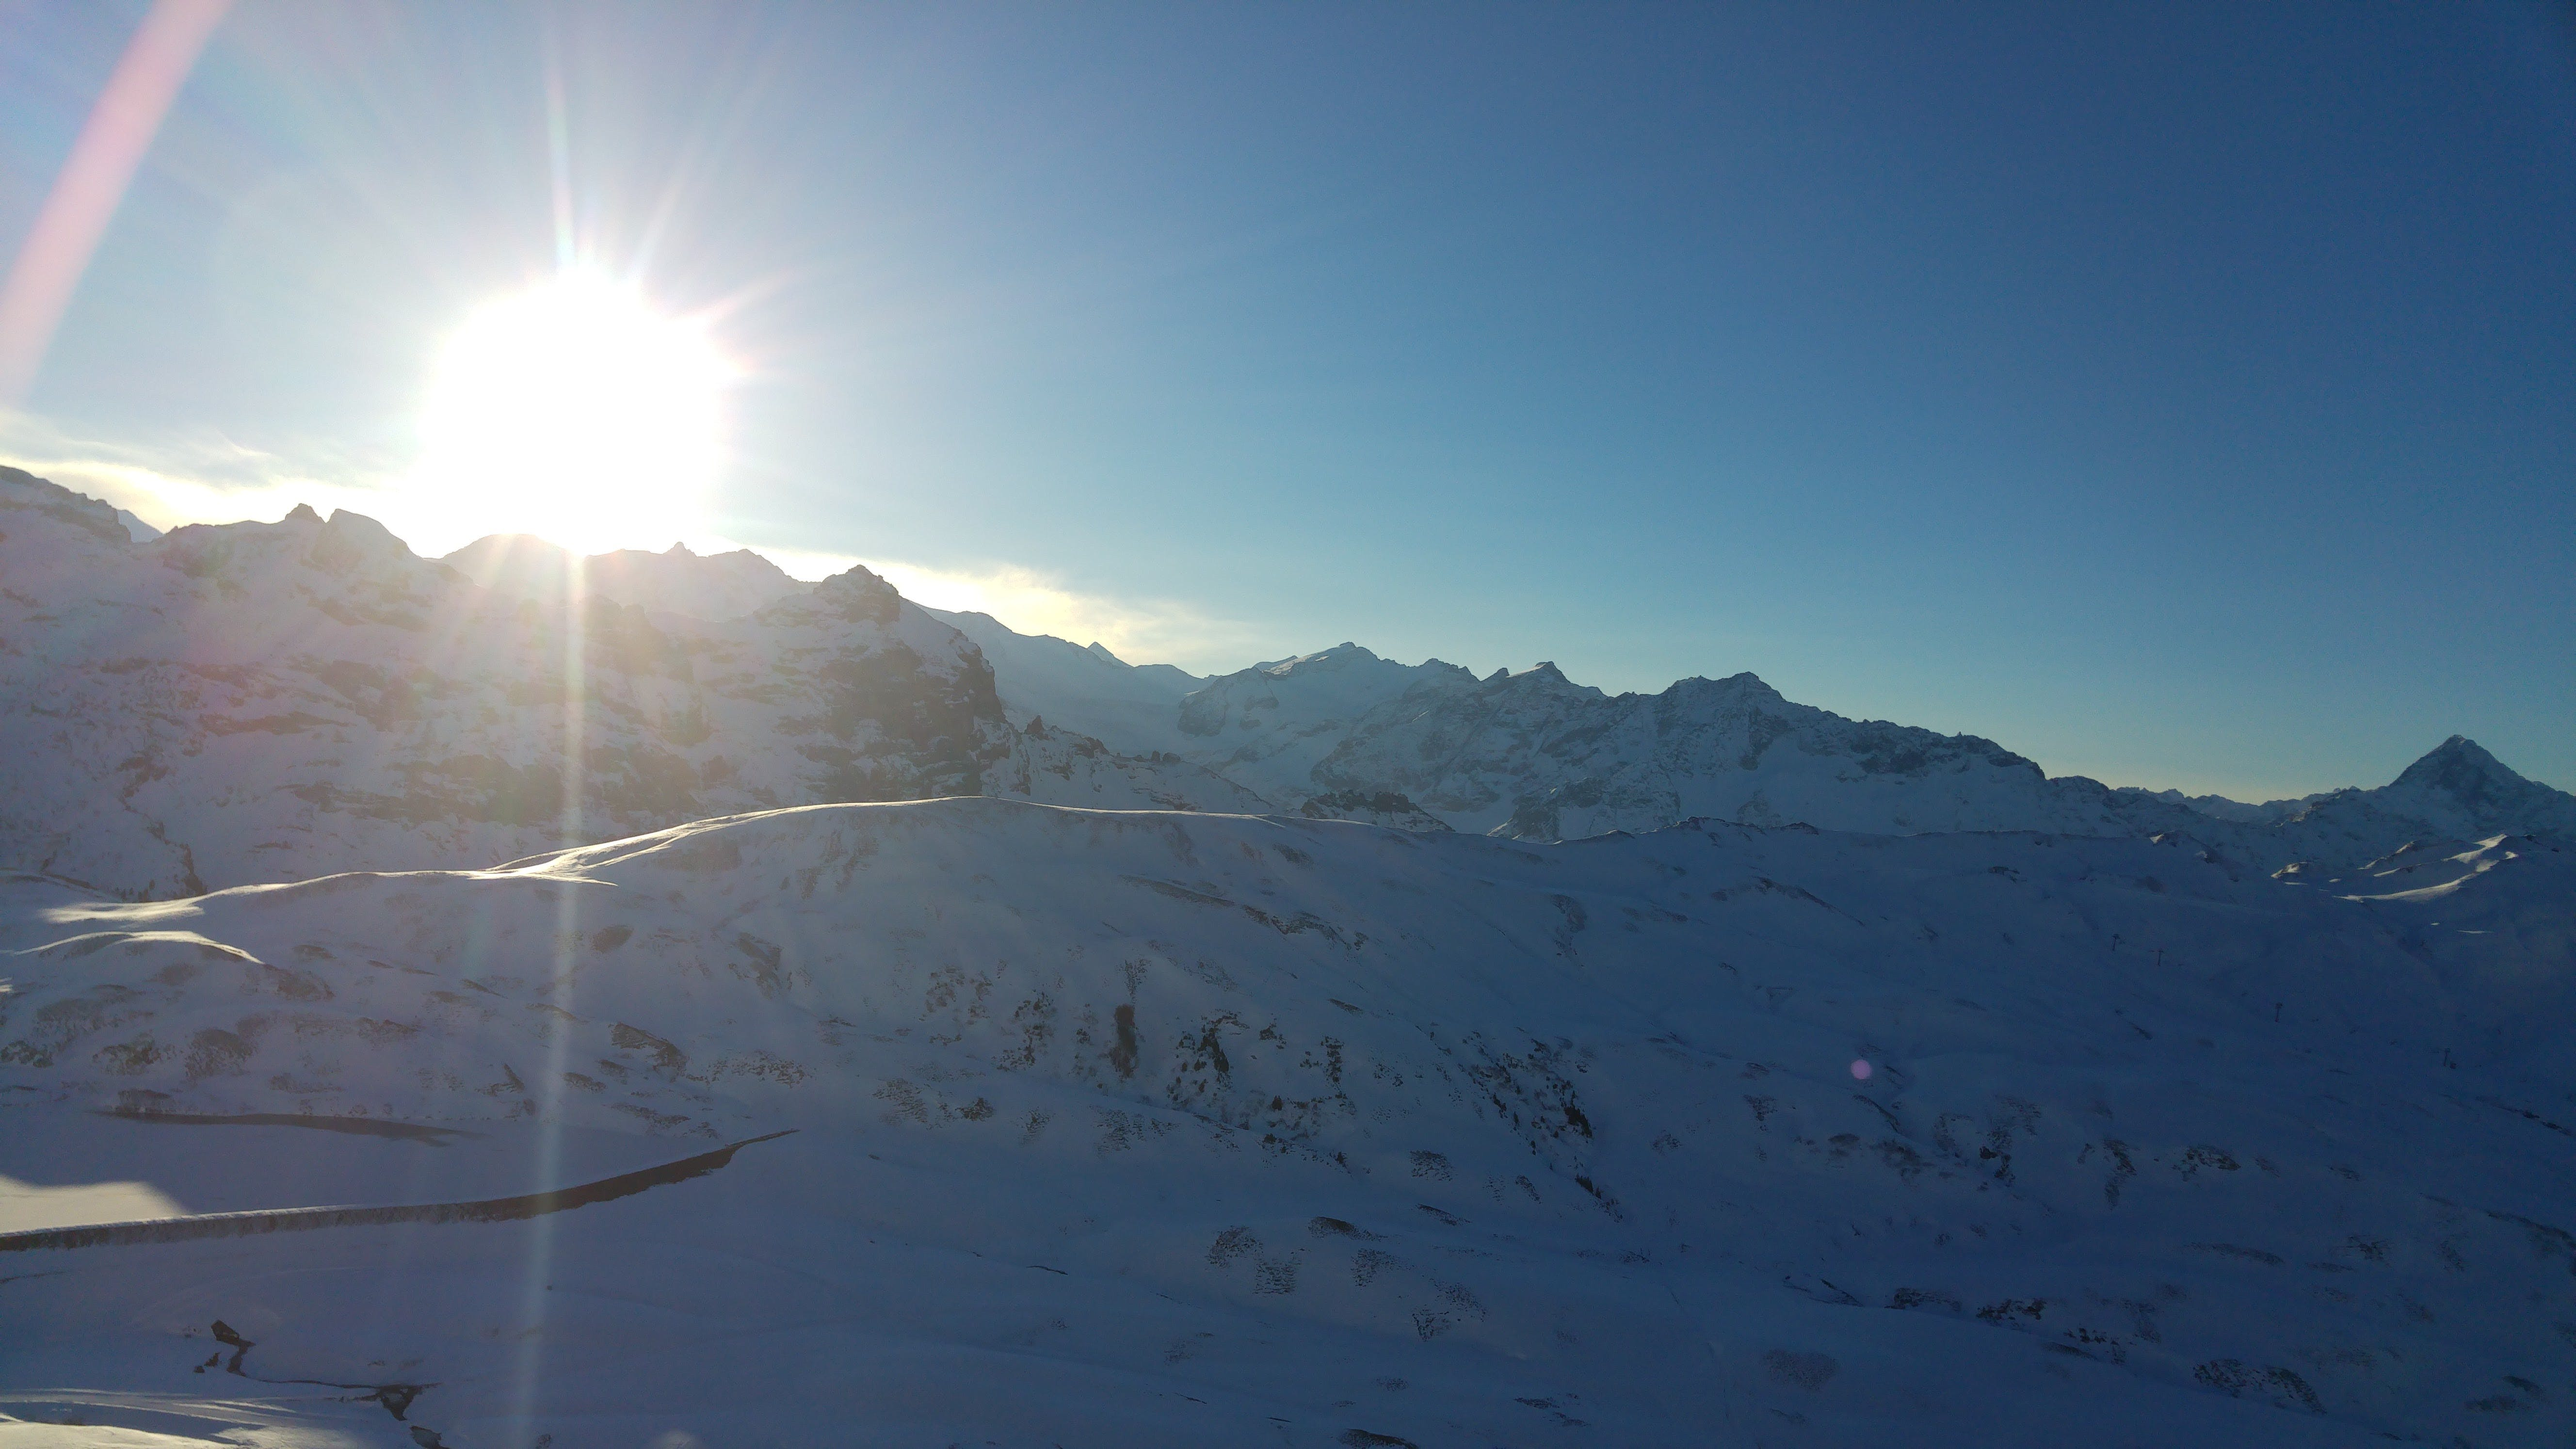 Kostenloses Stock Foto zu berg, himmel, natur, schnee